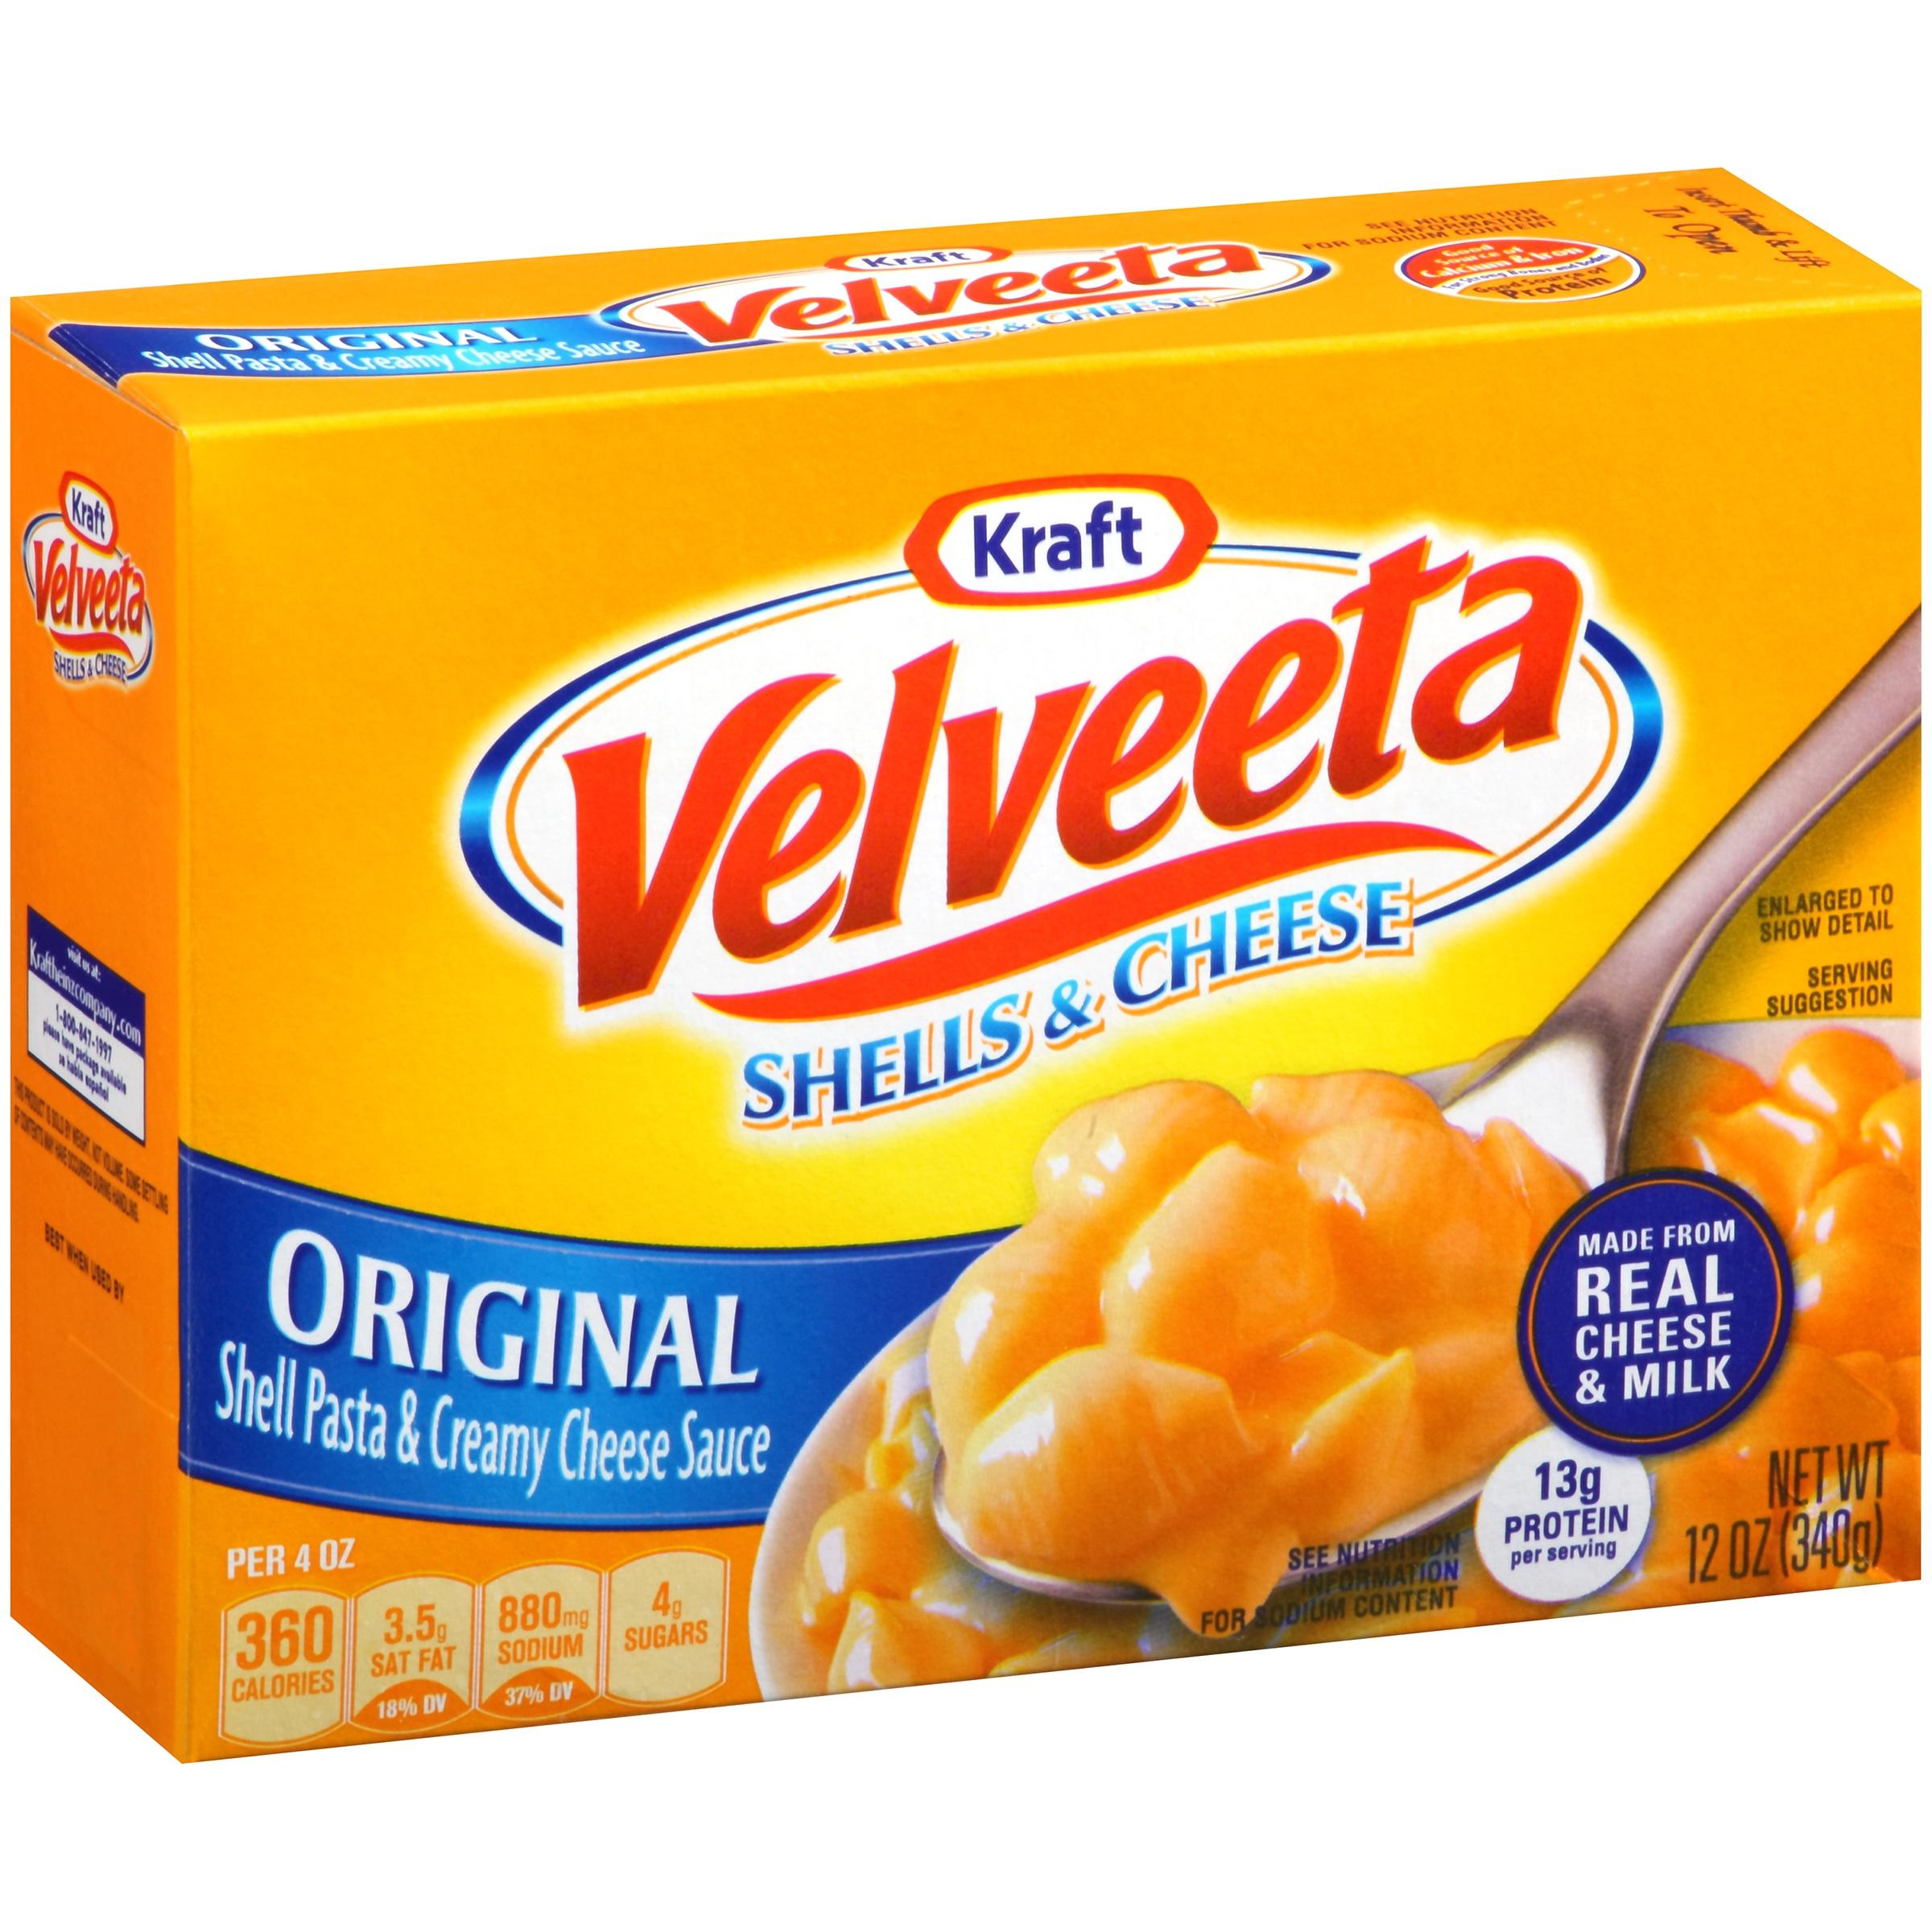 Kraft Original Velveeta Shells & Cheese, 12 oz